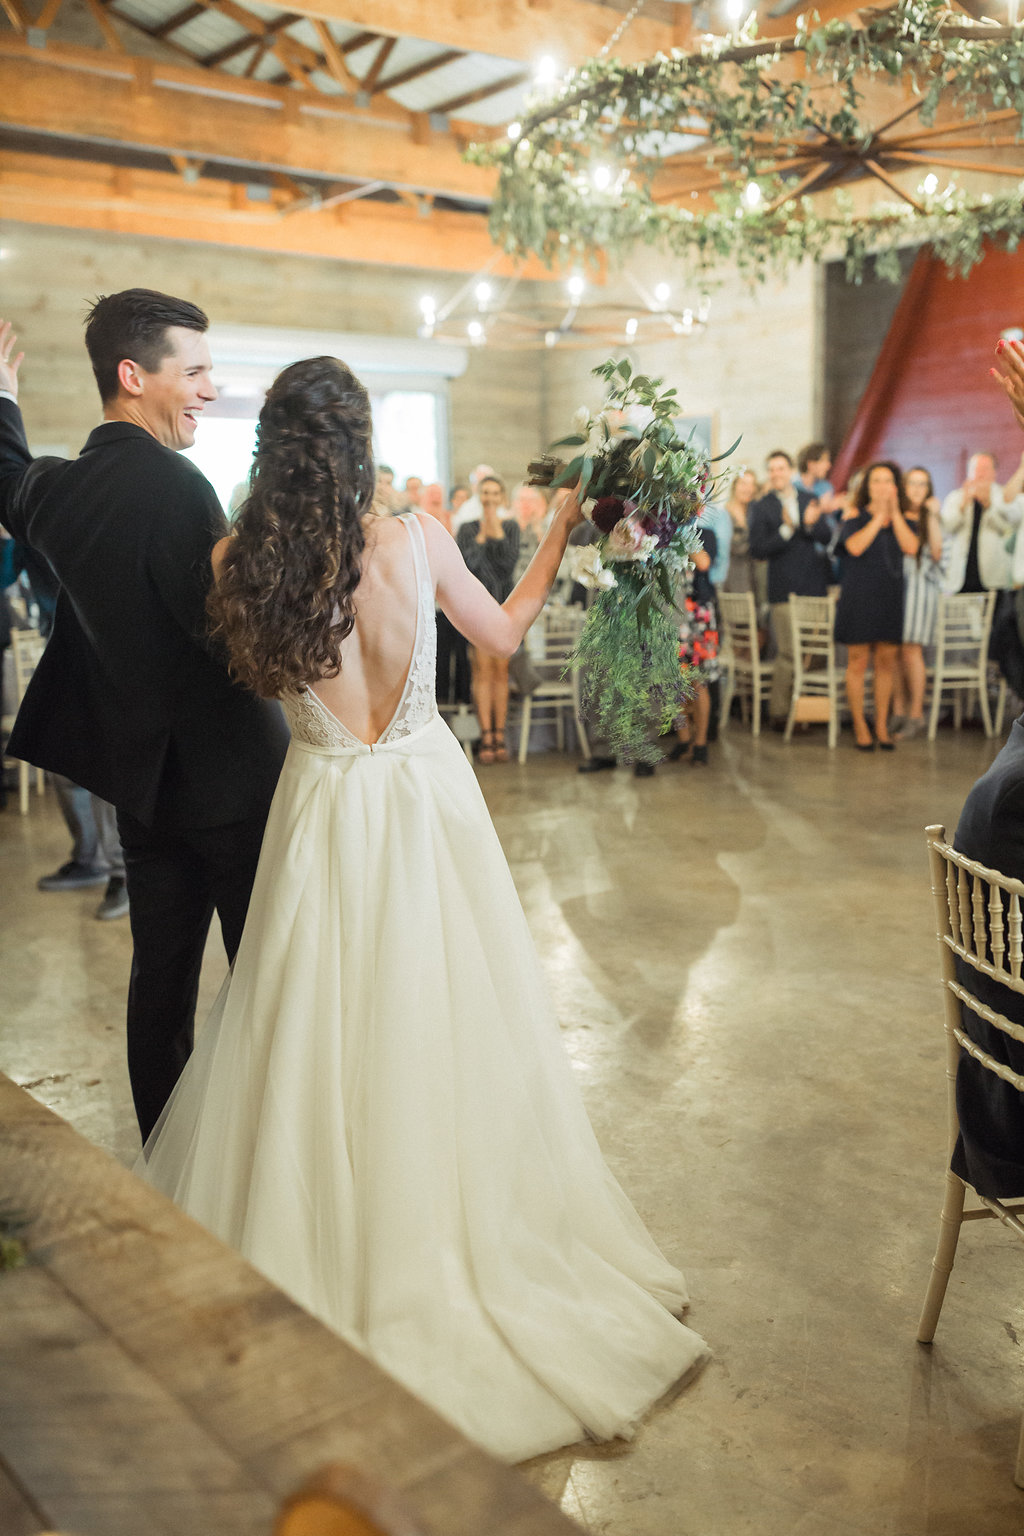 Honeysuckle-Hill-Weddings-Mallory-Patrick-107.jpg